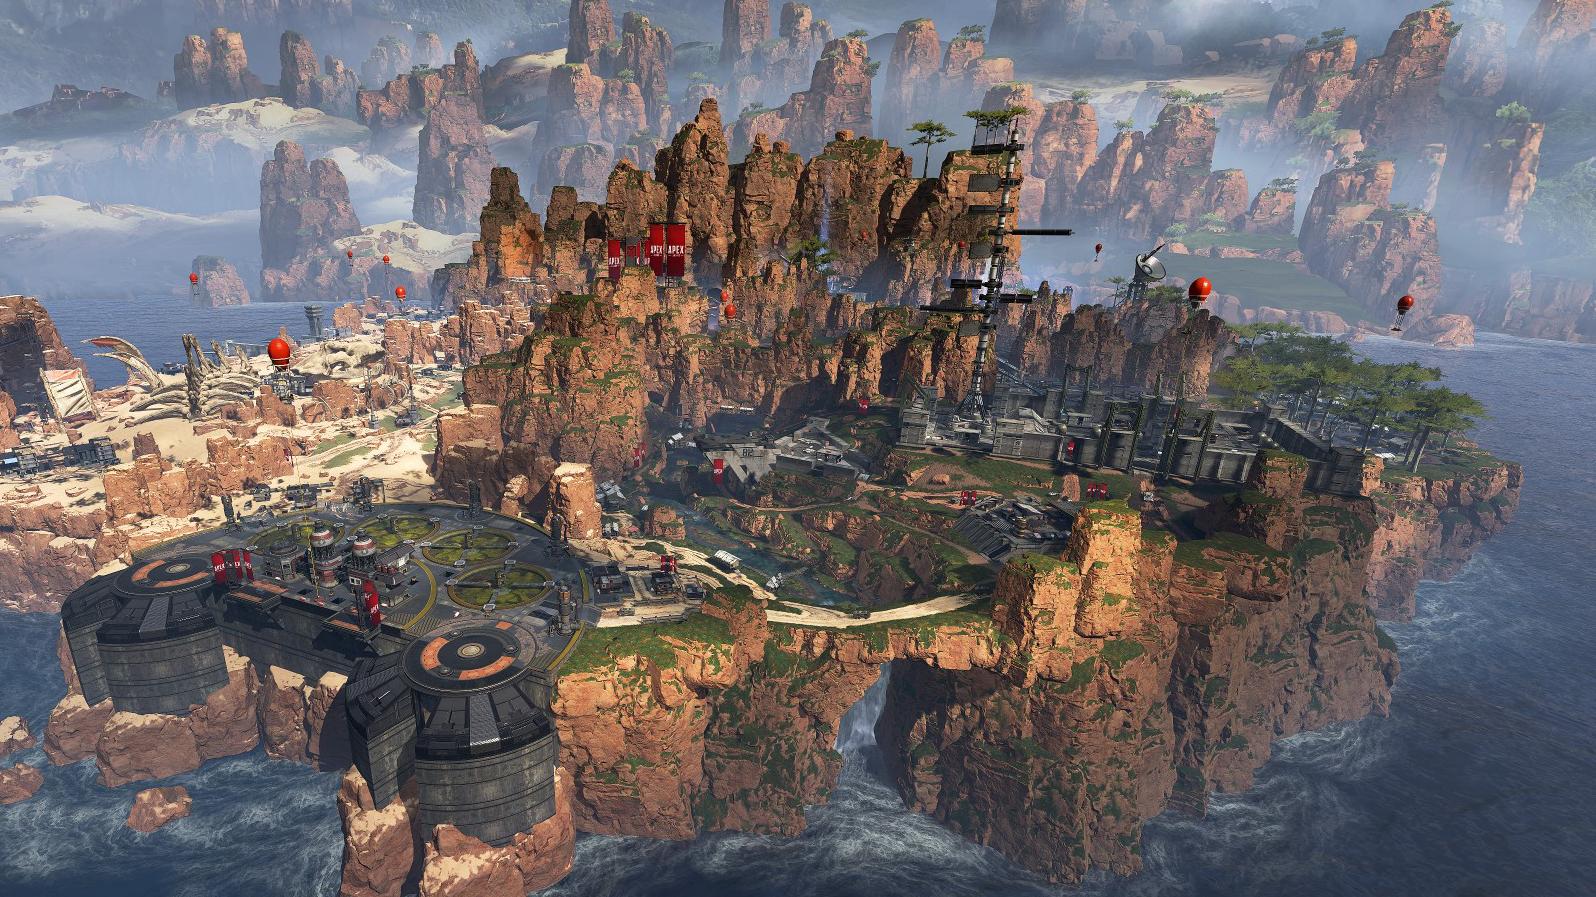 Image credit: Electronic Arts/Respawn Entertainment